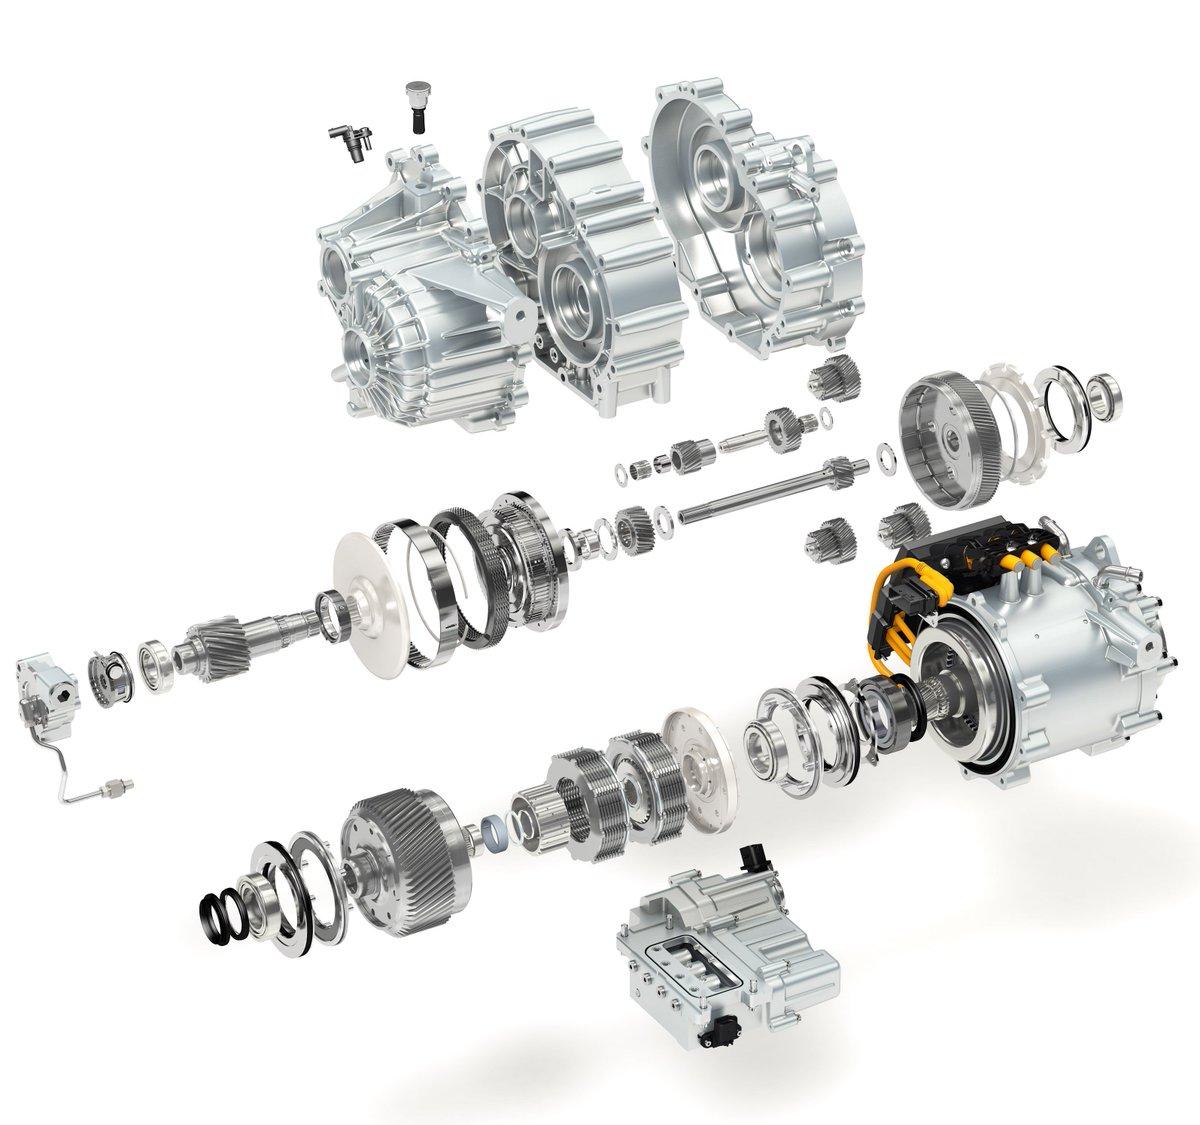 Gkn Motors